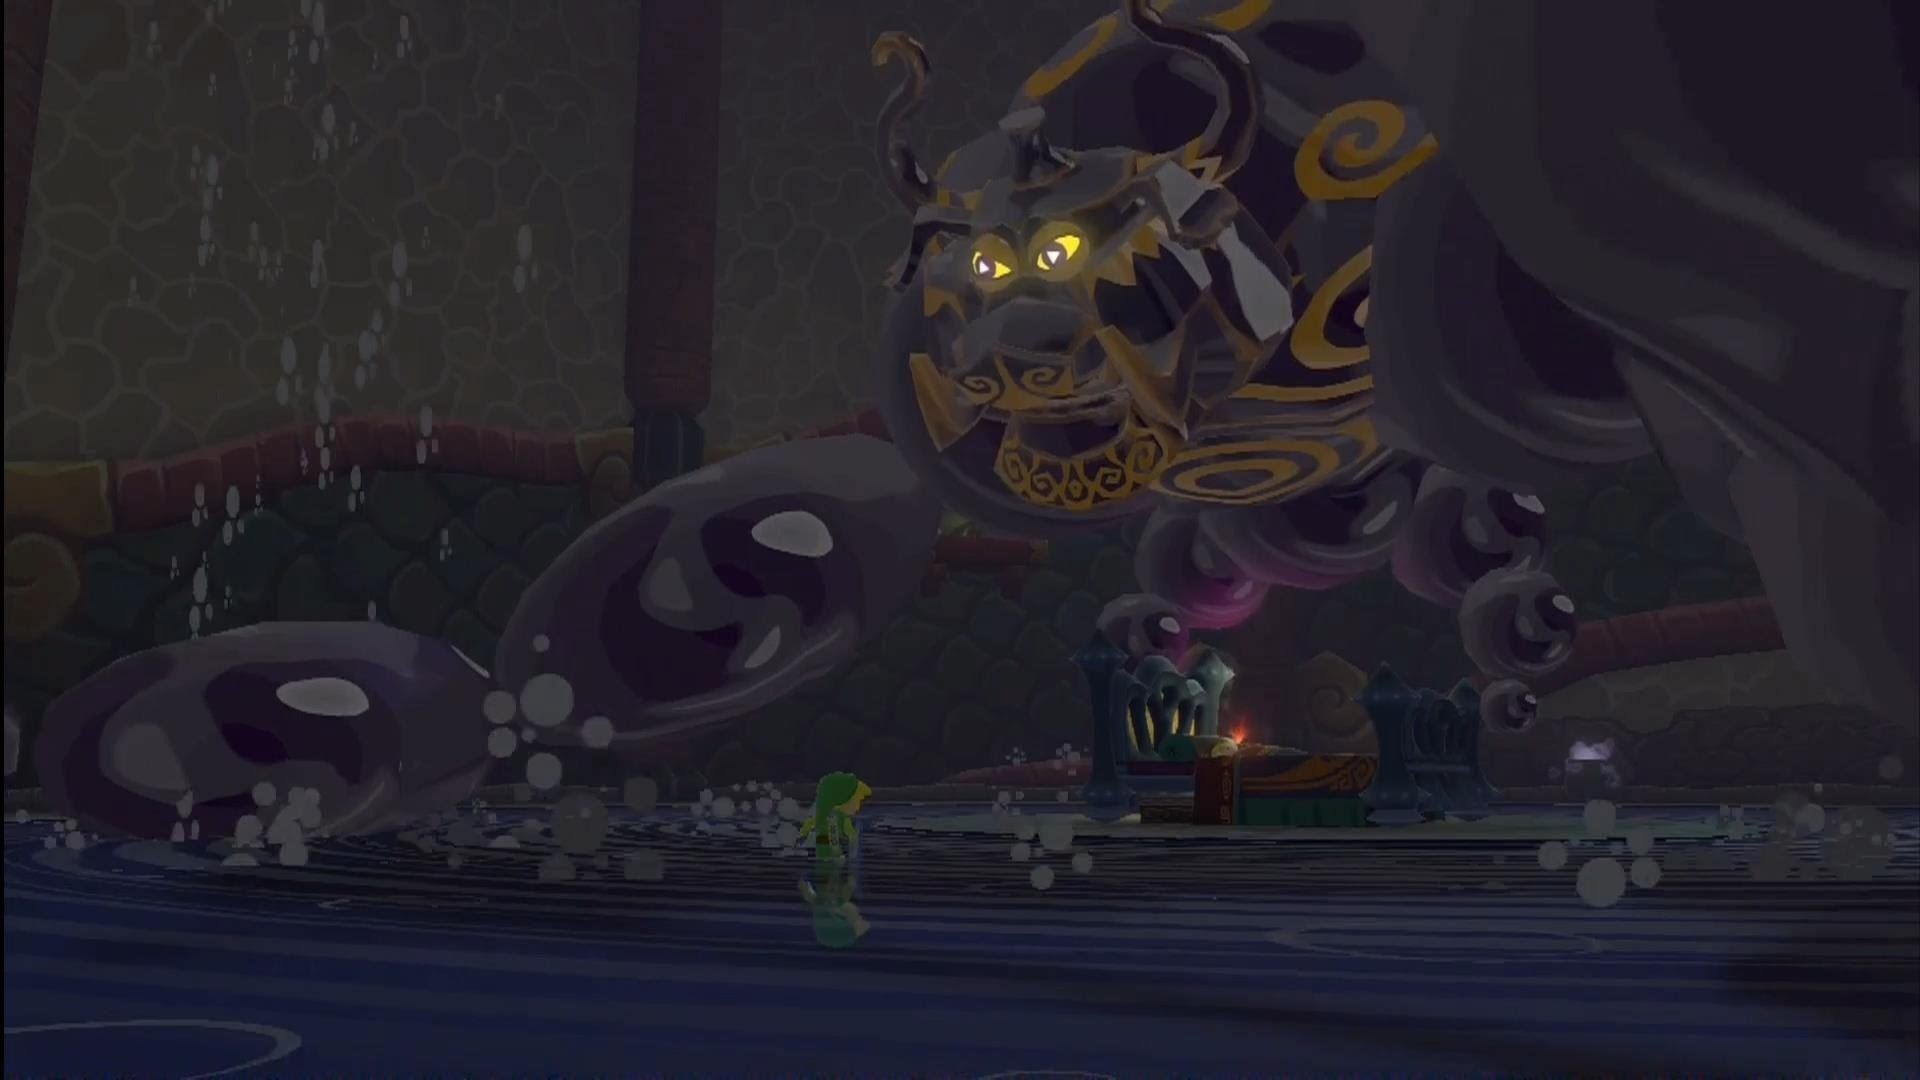 The Legend of Zelda: The Wind Waker HD – Puppet Ganon Boss Battle